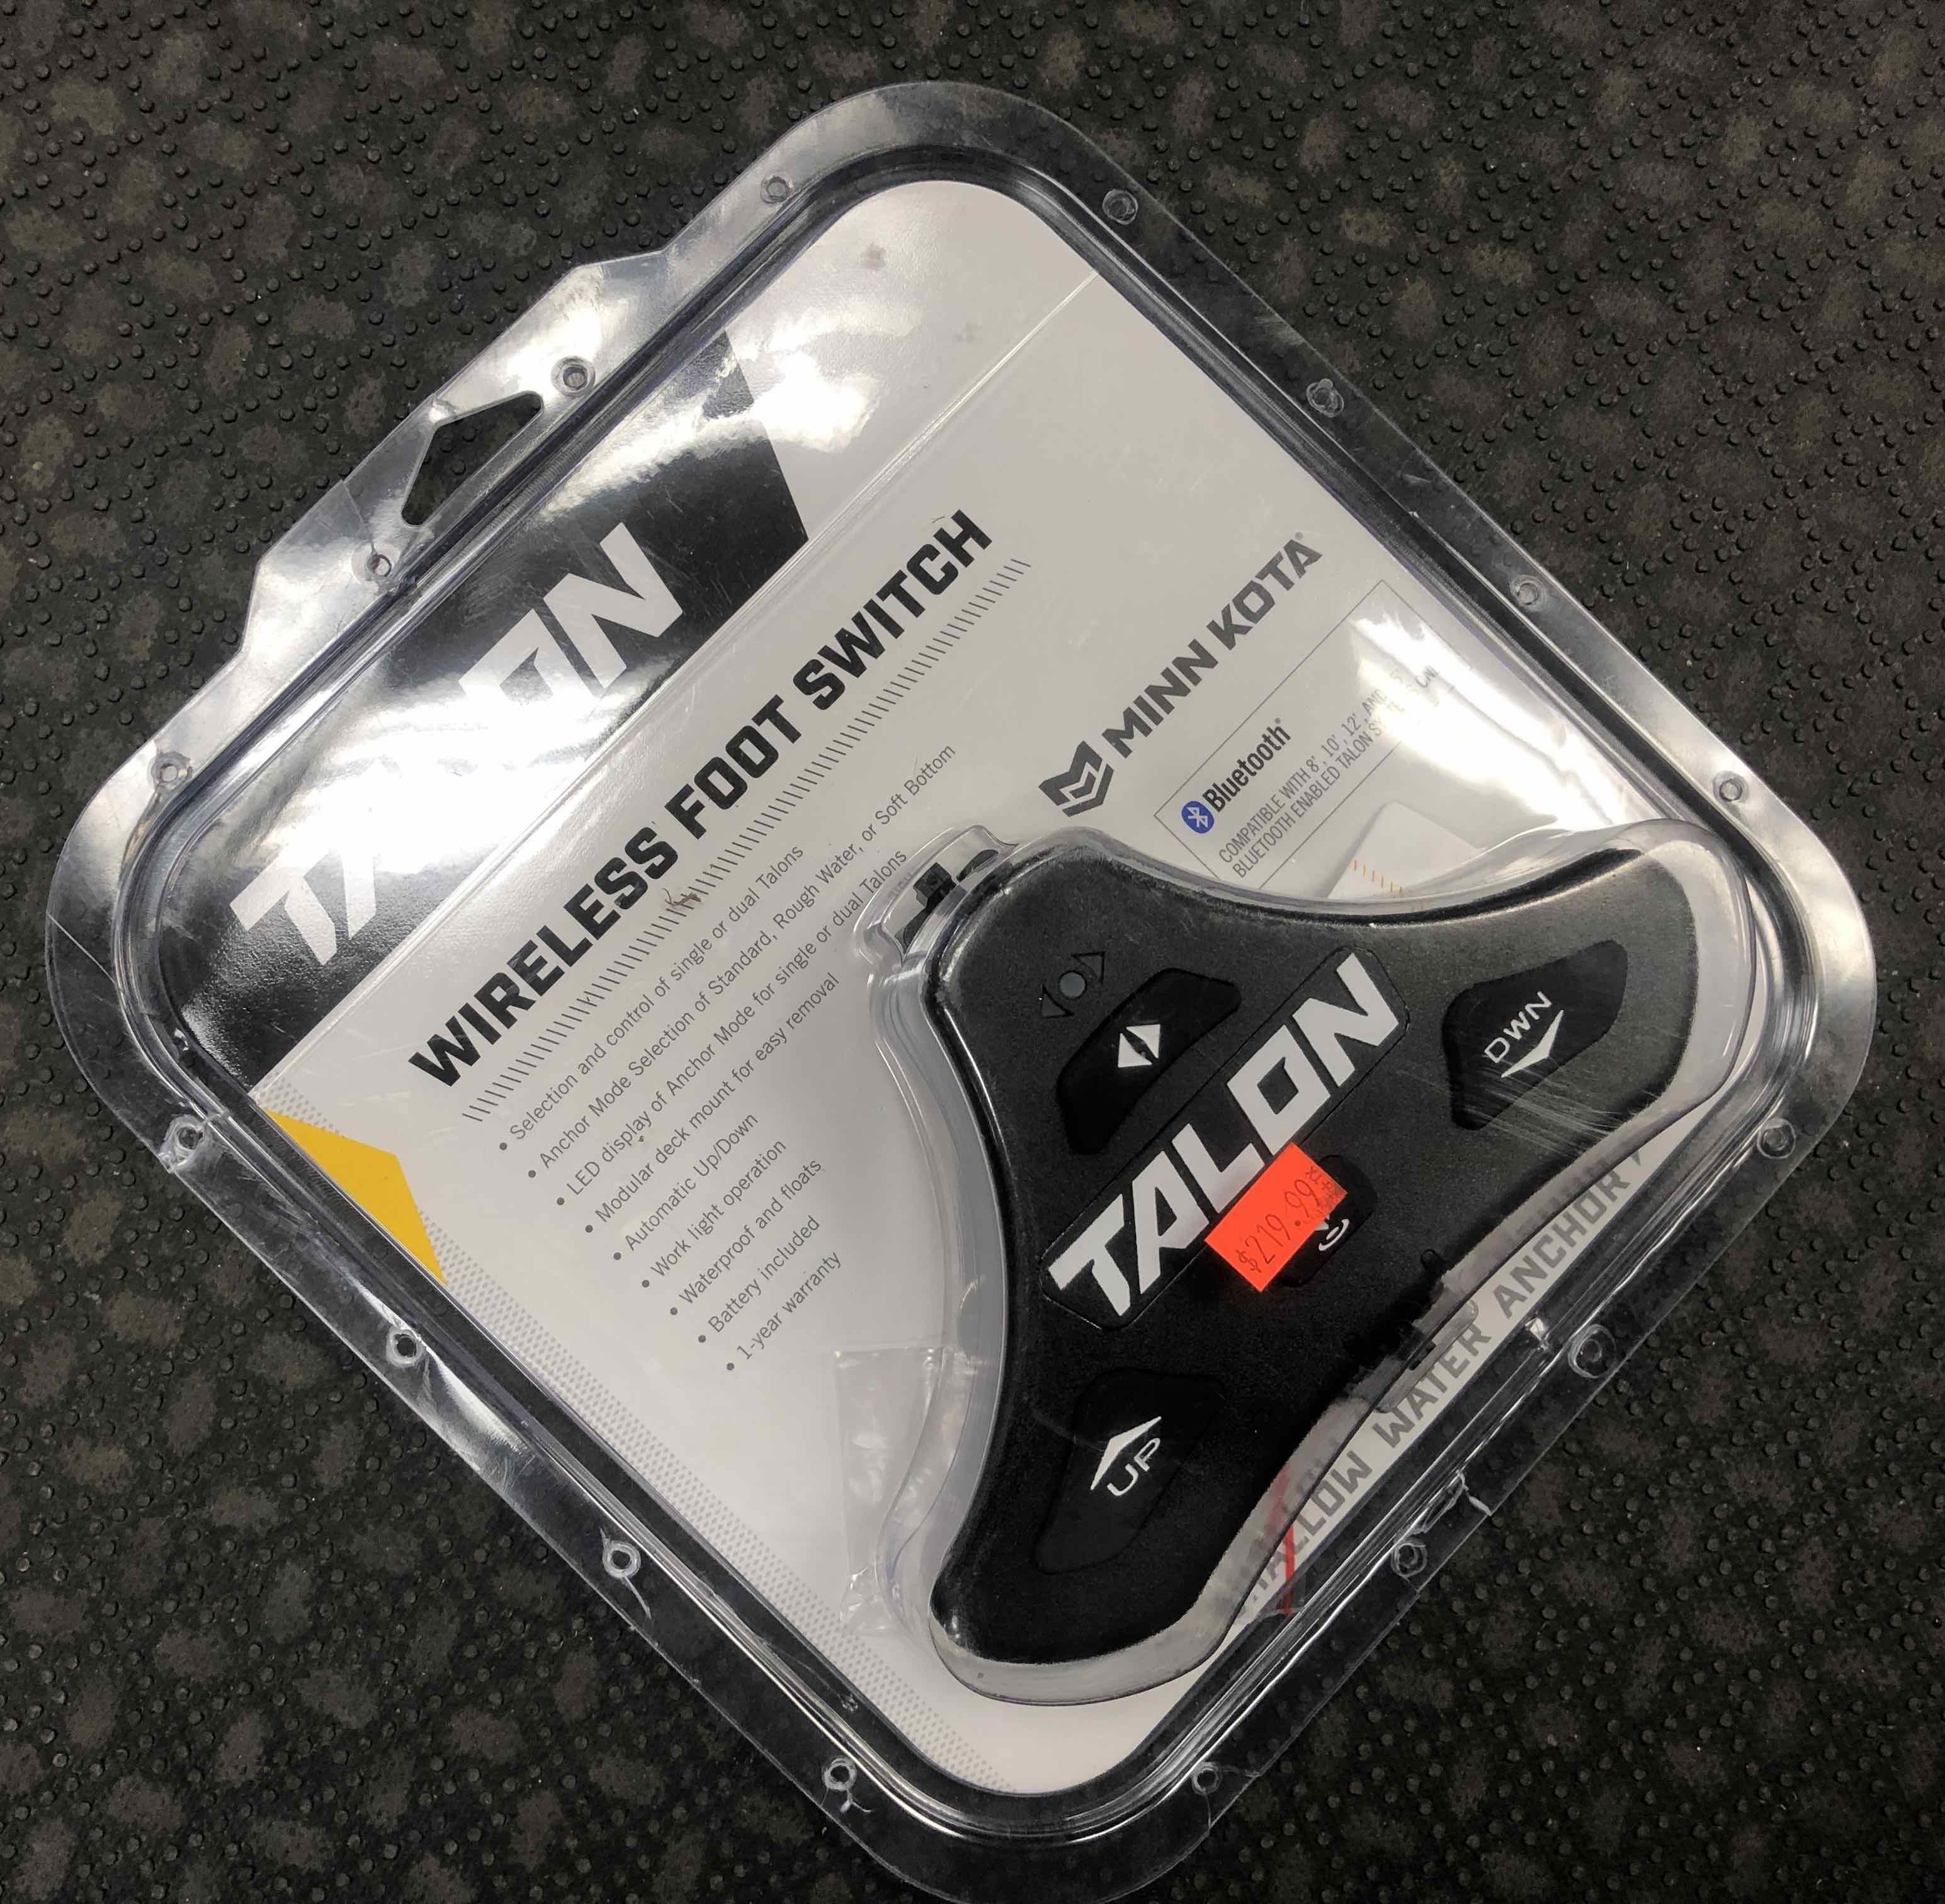 Johnson Outdoors - MinnKota Talon Wireless Foot Switch - NEW